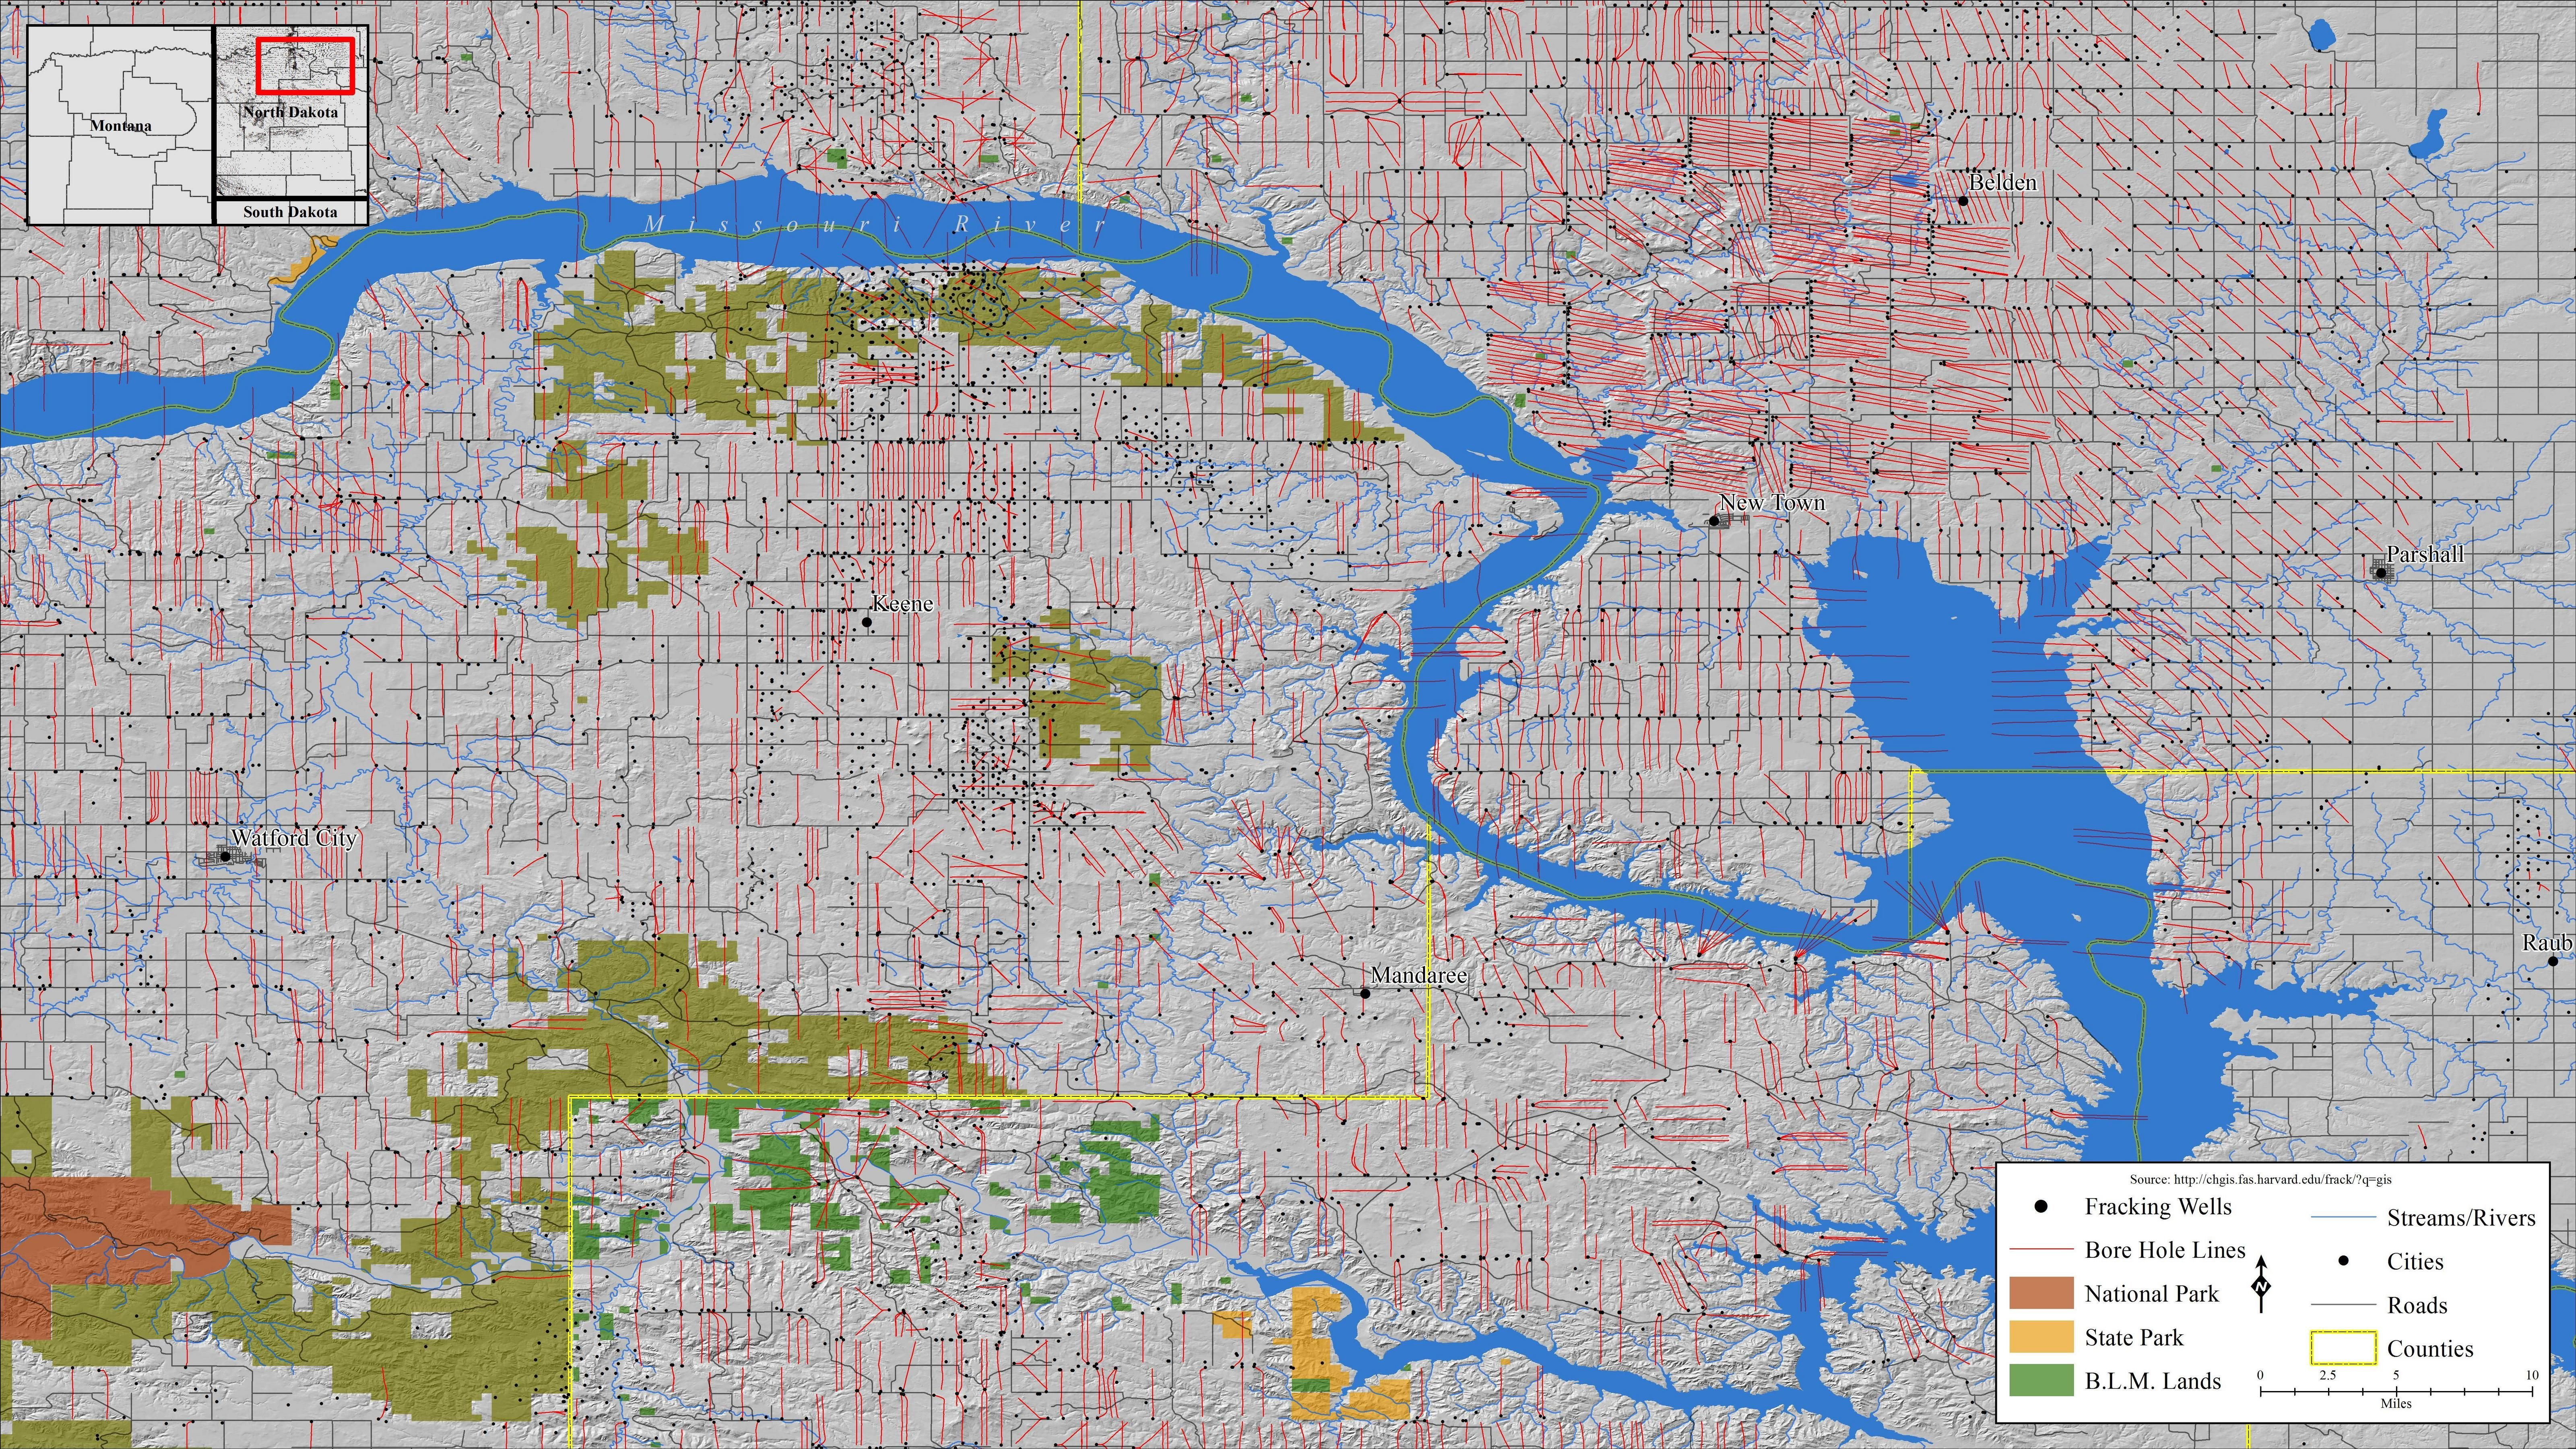 North Dakota Fracking Wells By Apophis Map Northdakota Fracking North Dakota Map Dakota